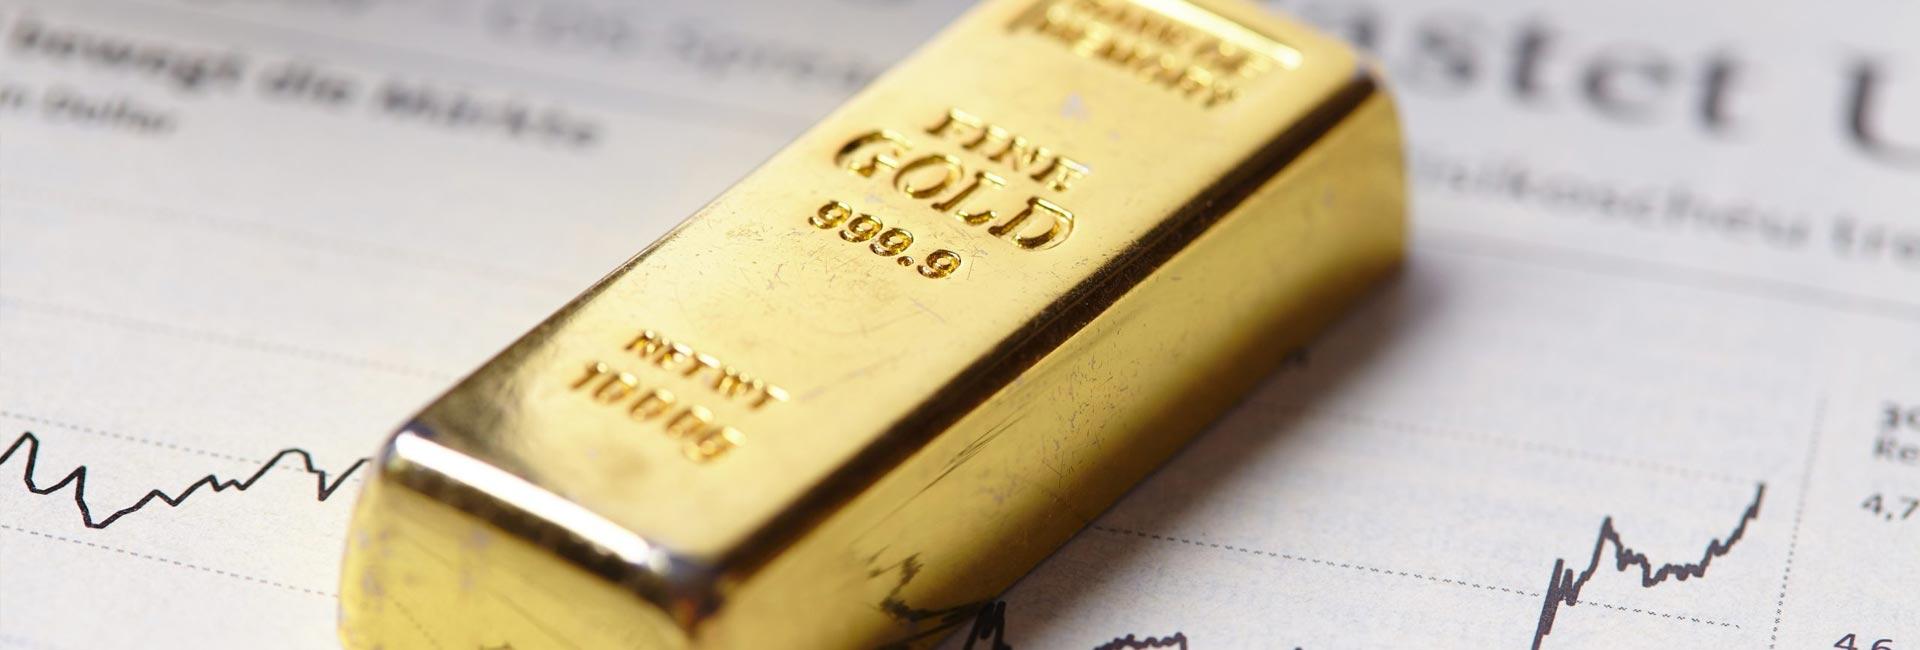 Brian-Suder-Gold